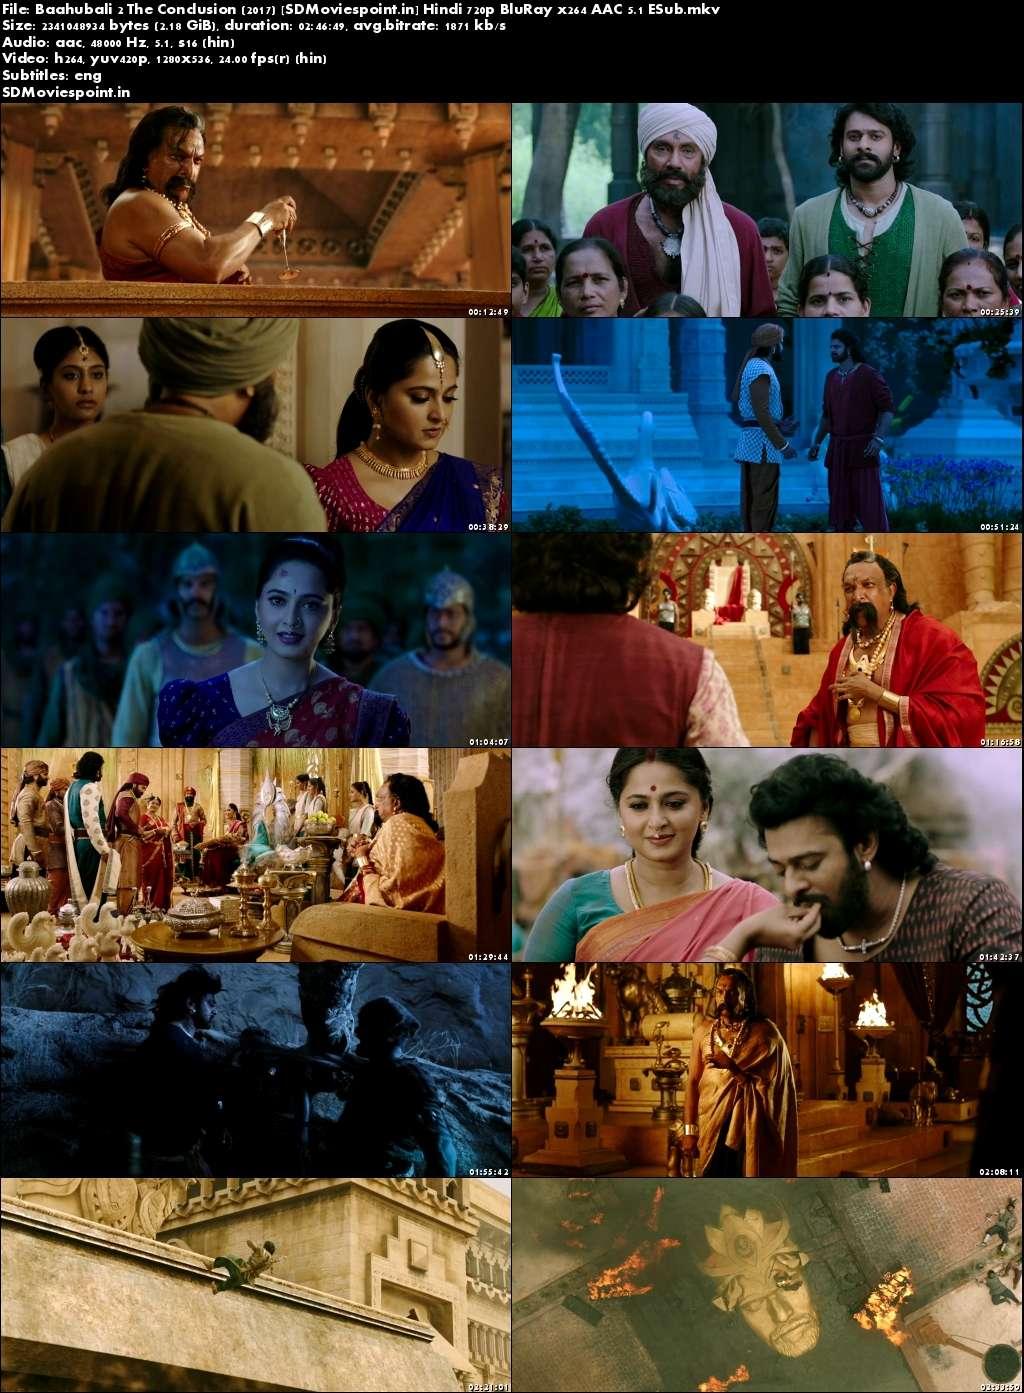 Screen Shots Baahubali 2 (2017) Full HD Movie Download Free In Hindi 720p